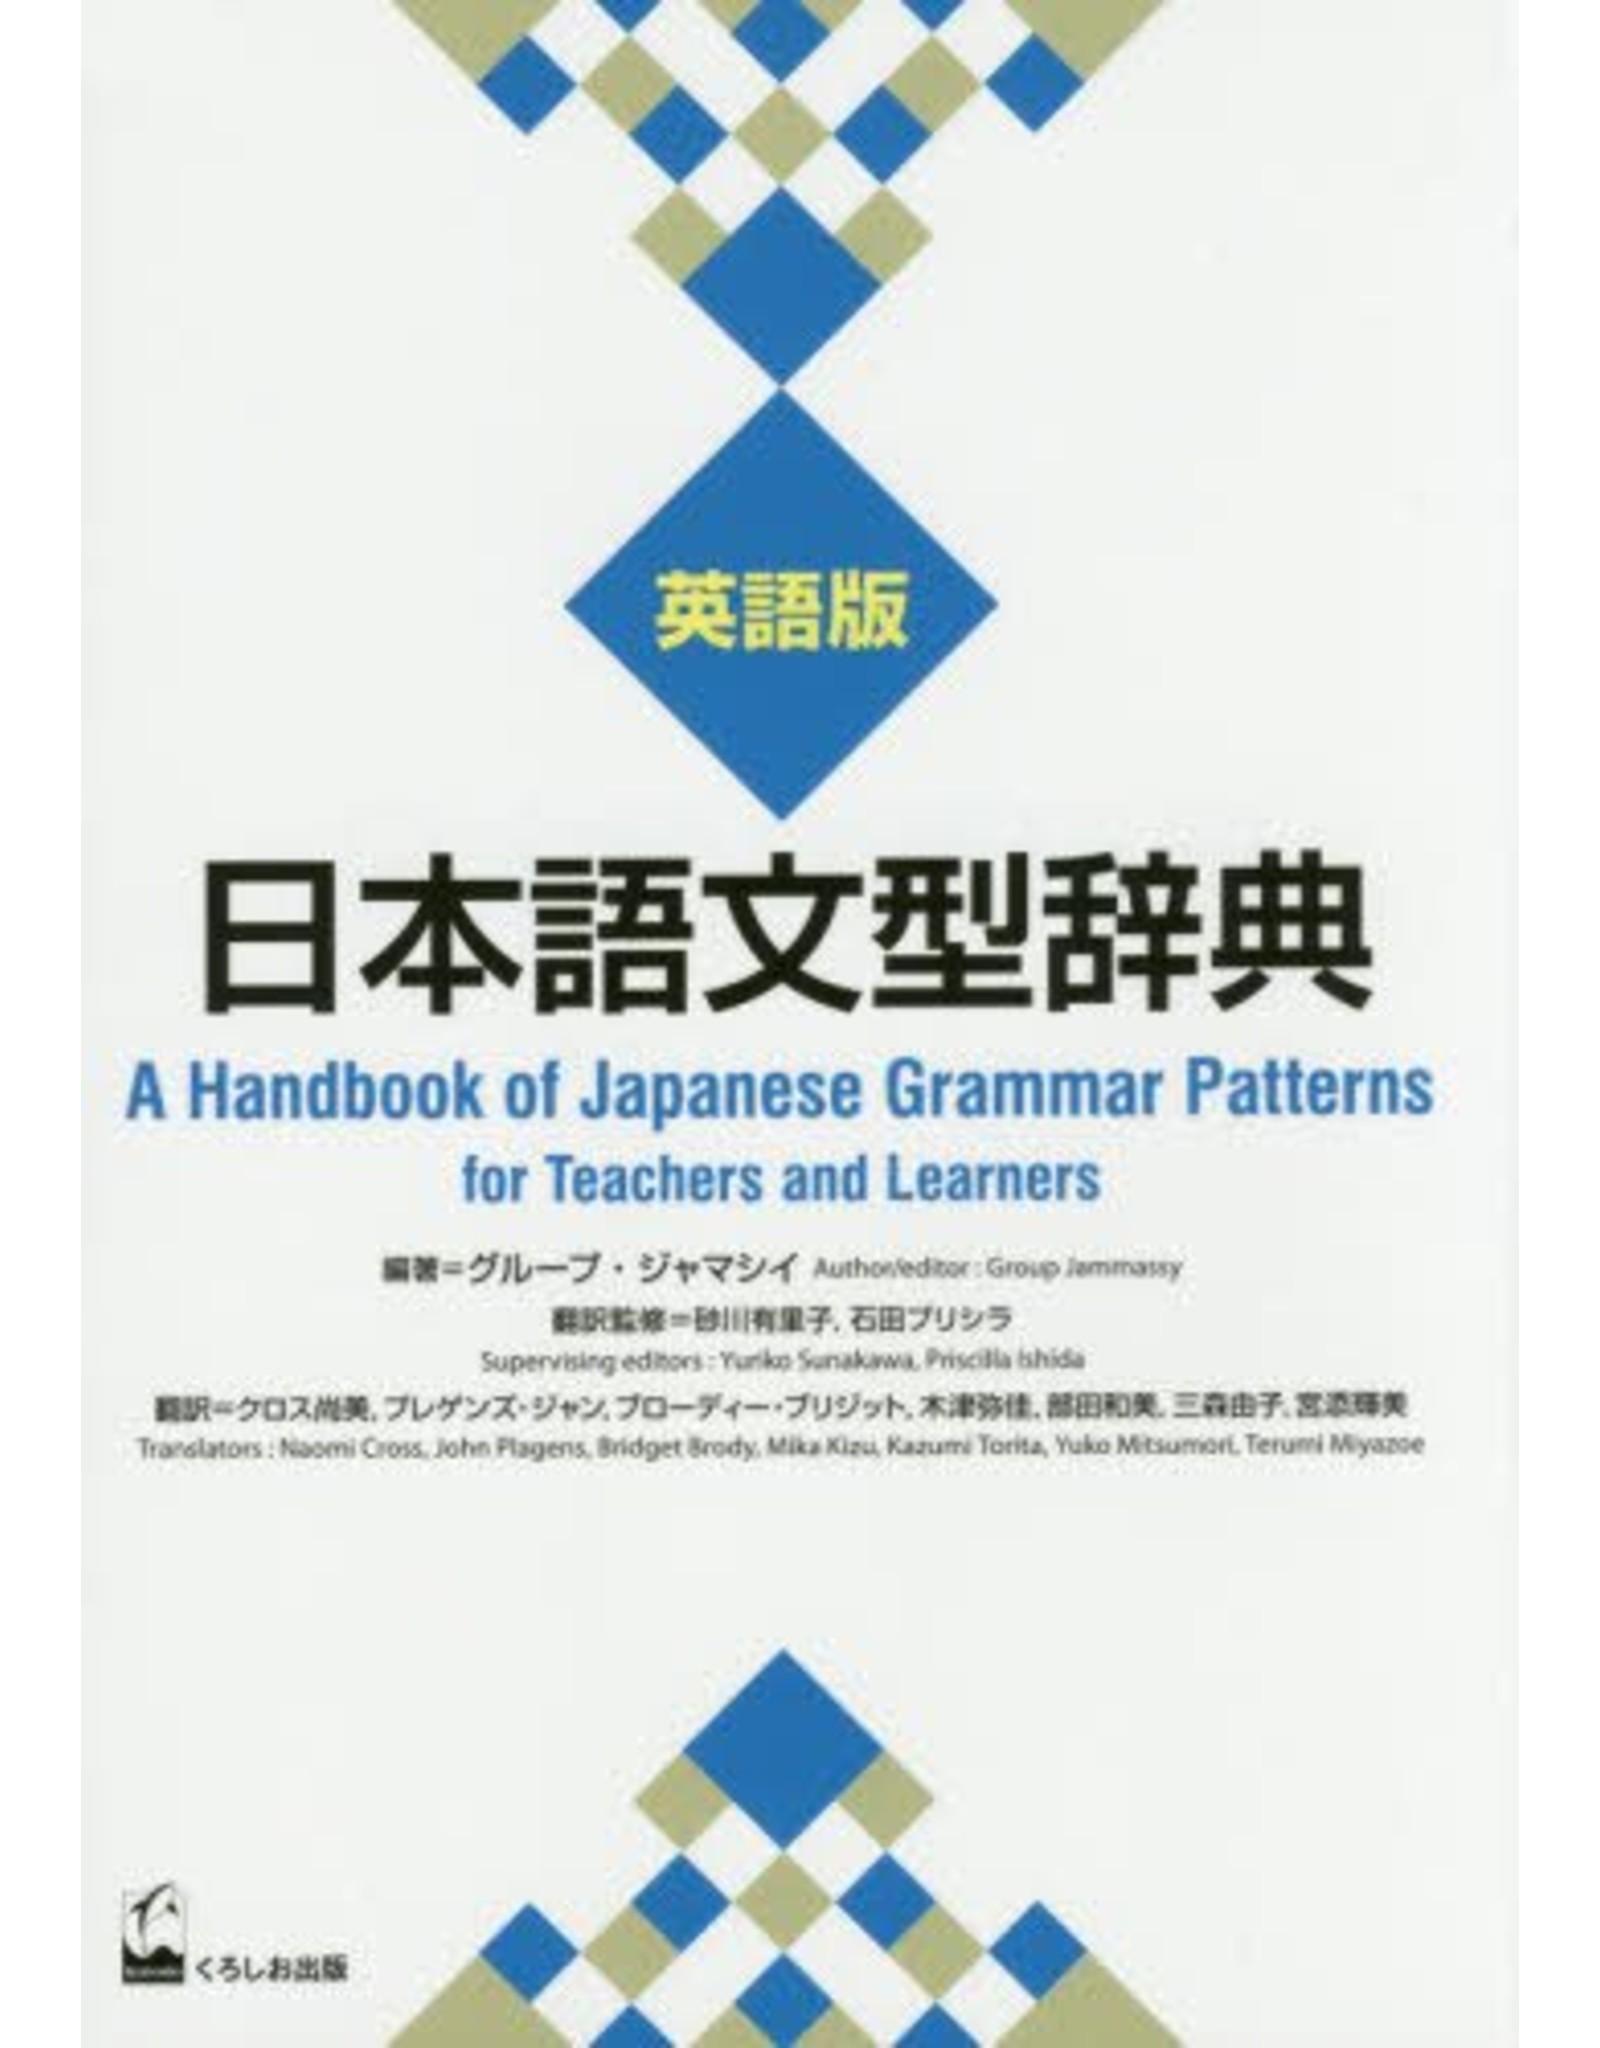 KUROSHIO A HANDBOOK OF JAPANESE GRAMMAR PATTERNS FOR TEACHERS AND LEARNERS (ENGLISH EDITION)